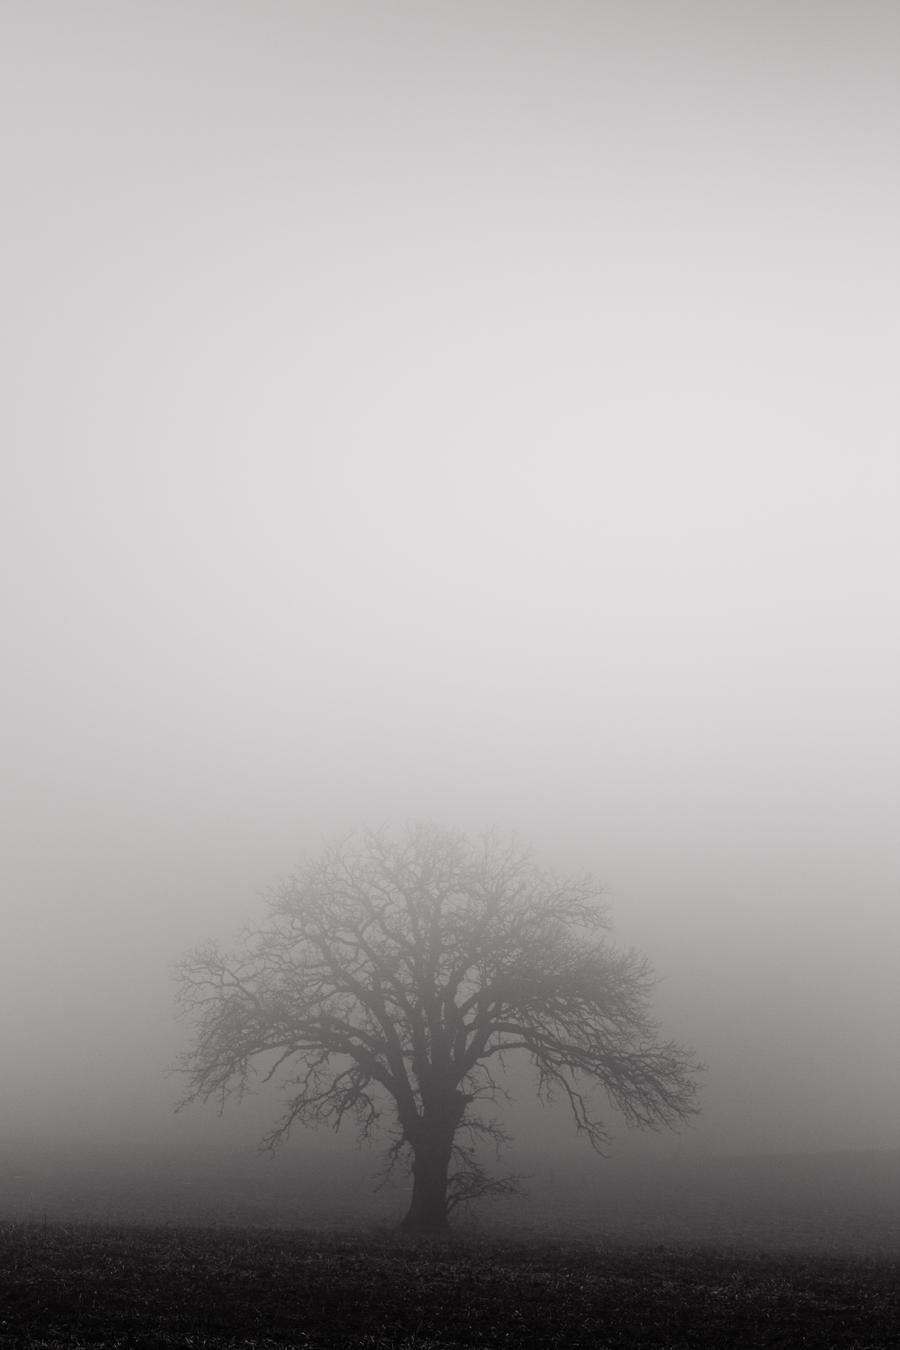 Winter Fog by Shane-Morelock